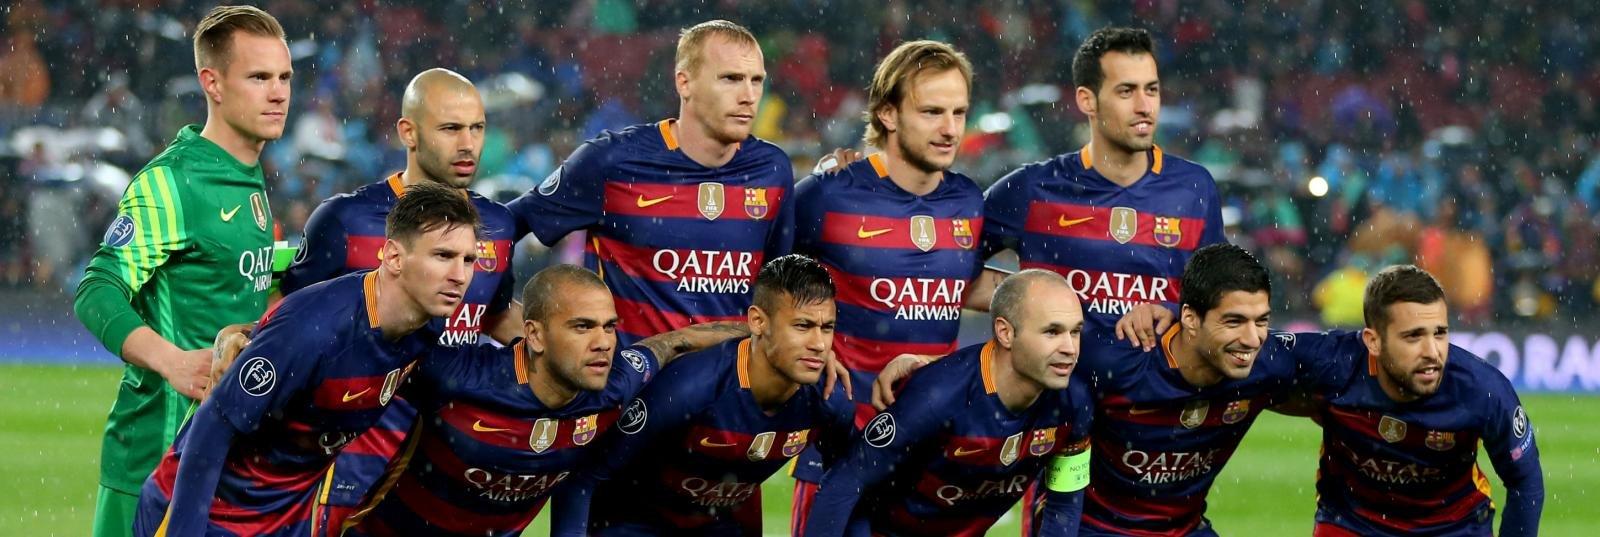 Fc Barcelona Vs Atletico Madrid Champions League Preview Prediction Shoot